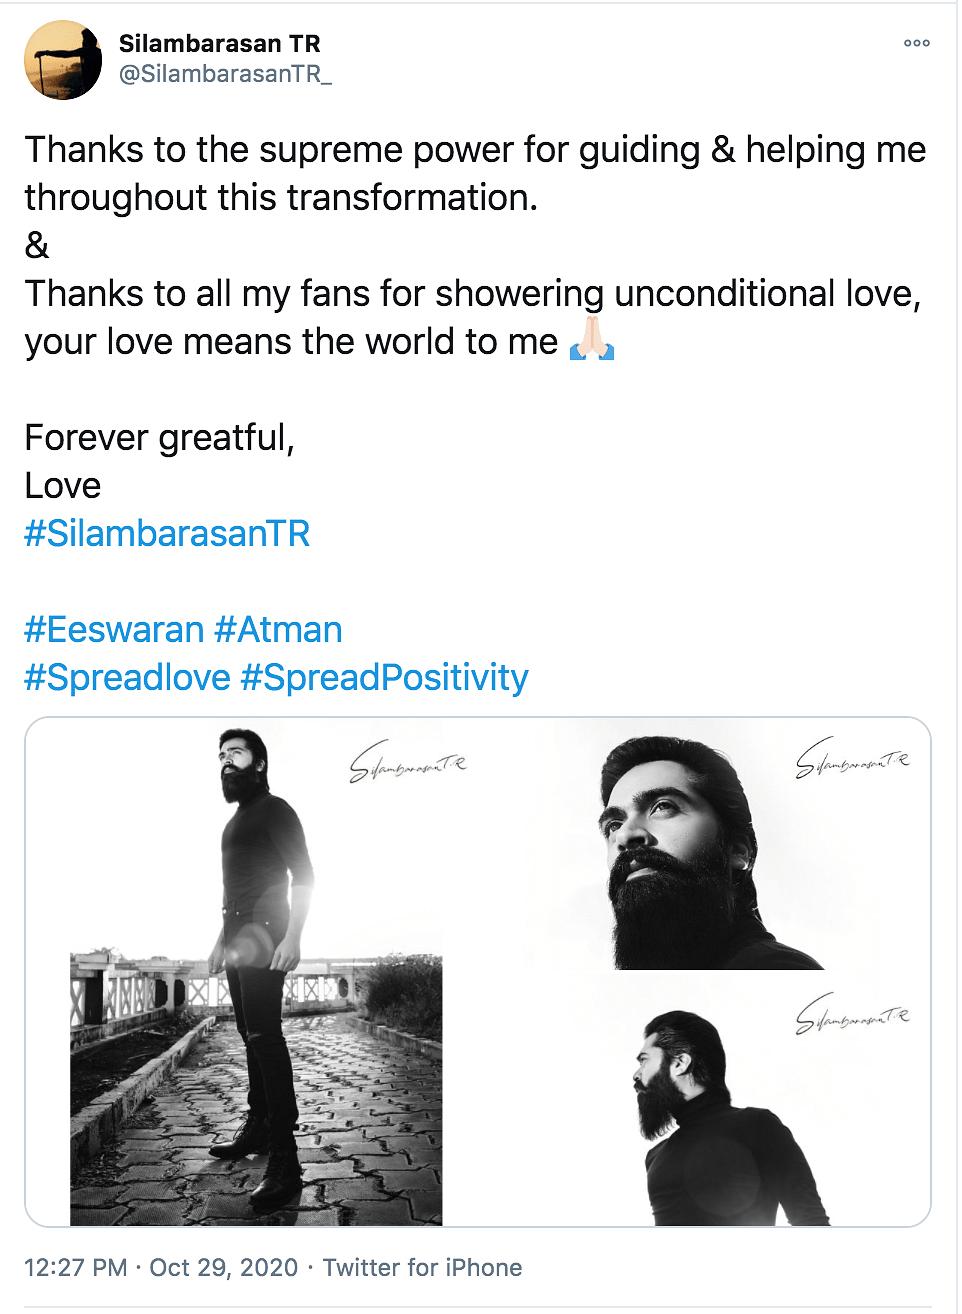 Actor Silambarasan's Twitter post.